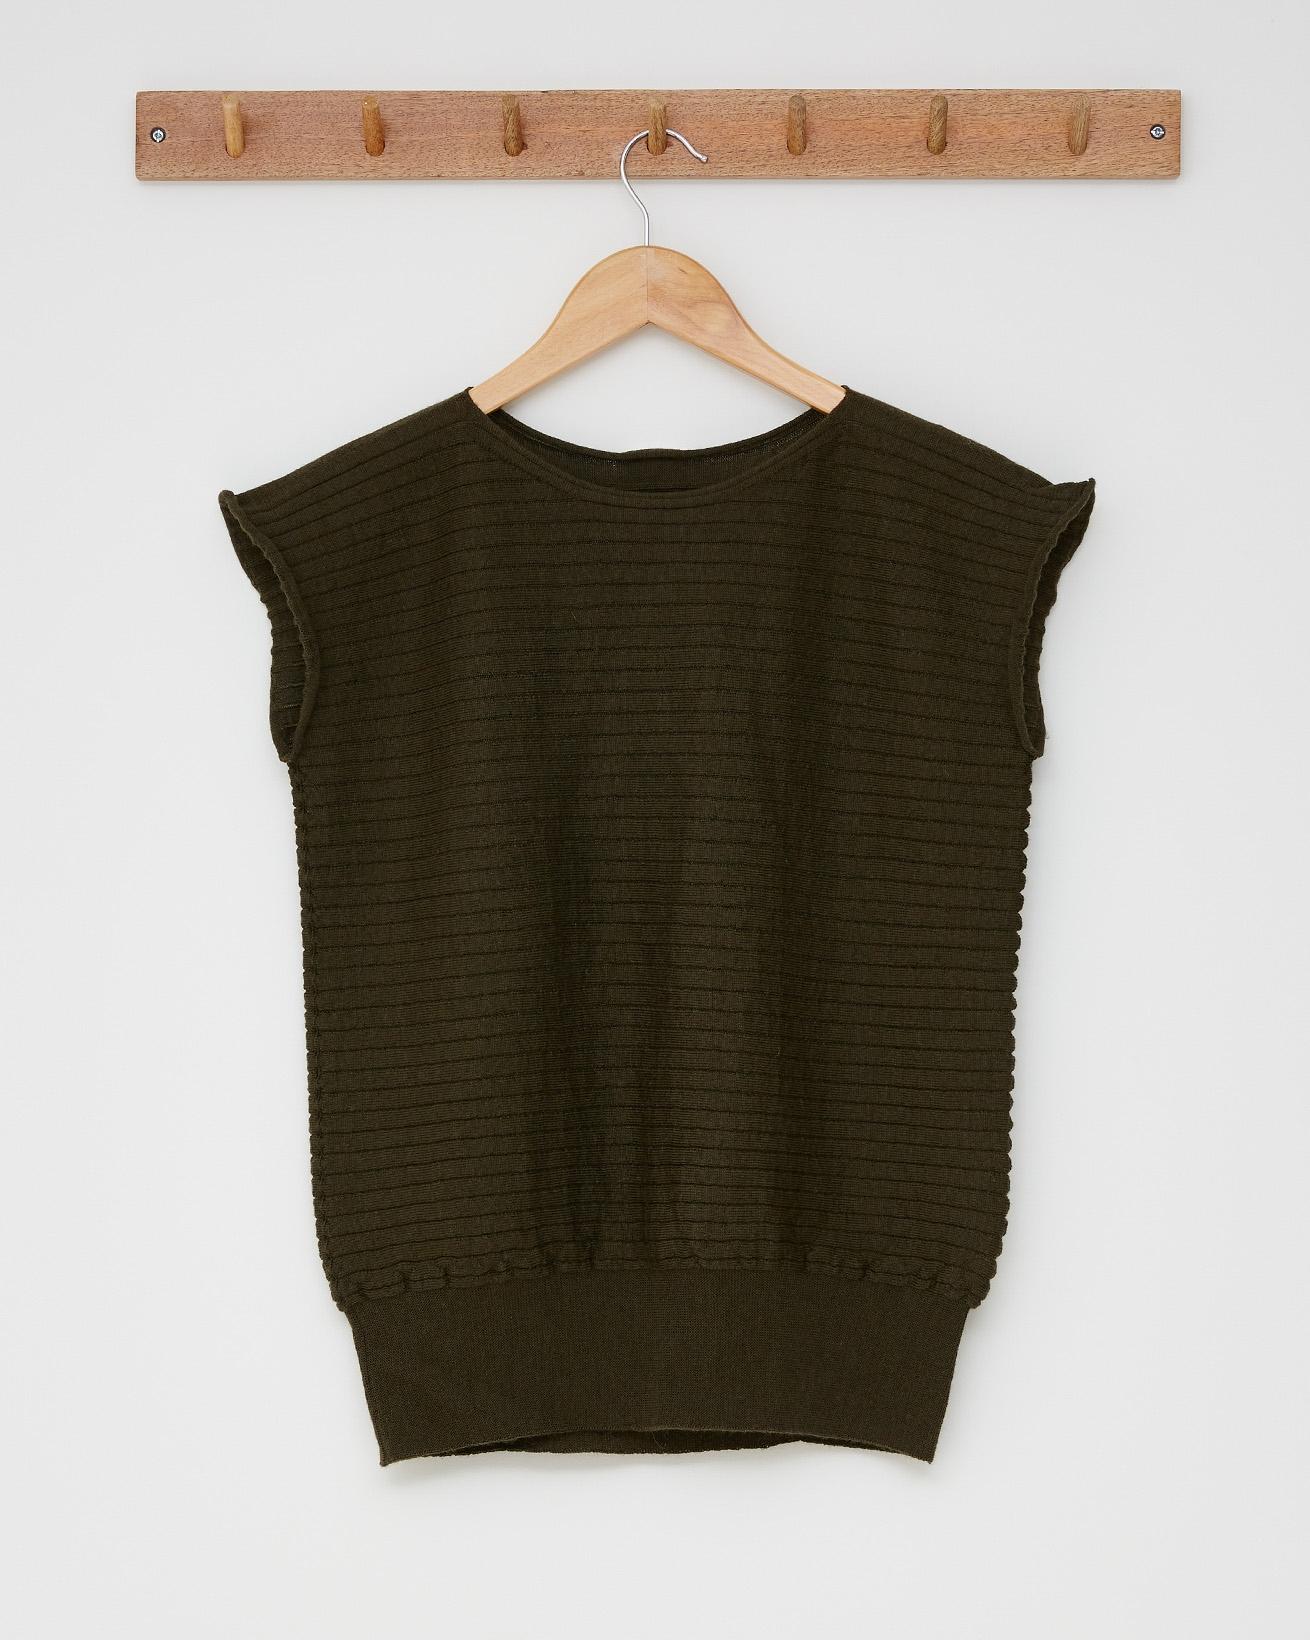 Merino horizontal rib top - Size Small - Olive - 2516